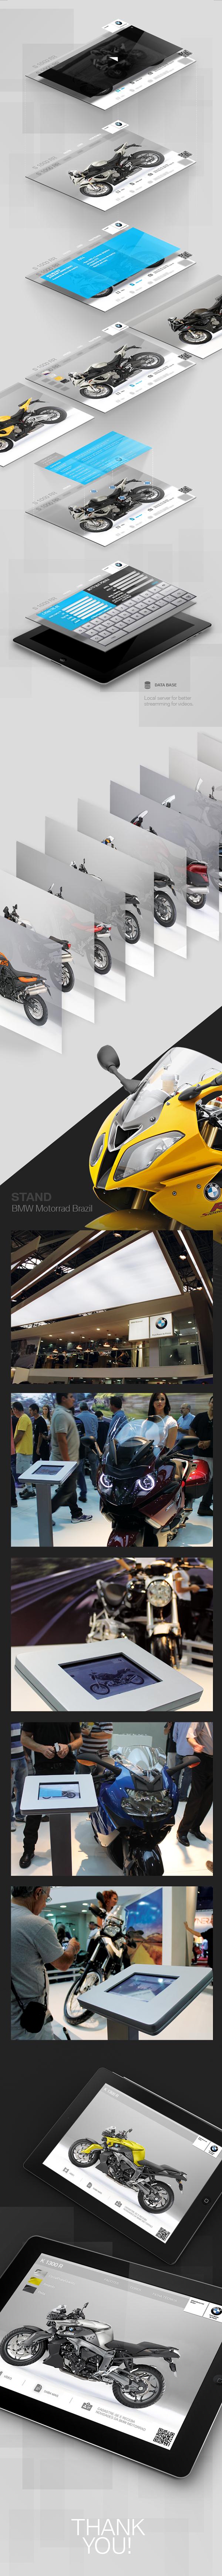 iPad BMW BMW Motorrad toten interface design design app aplicativo mobile motorcycle